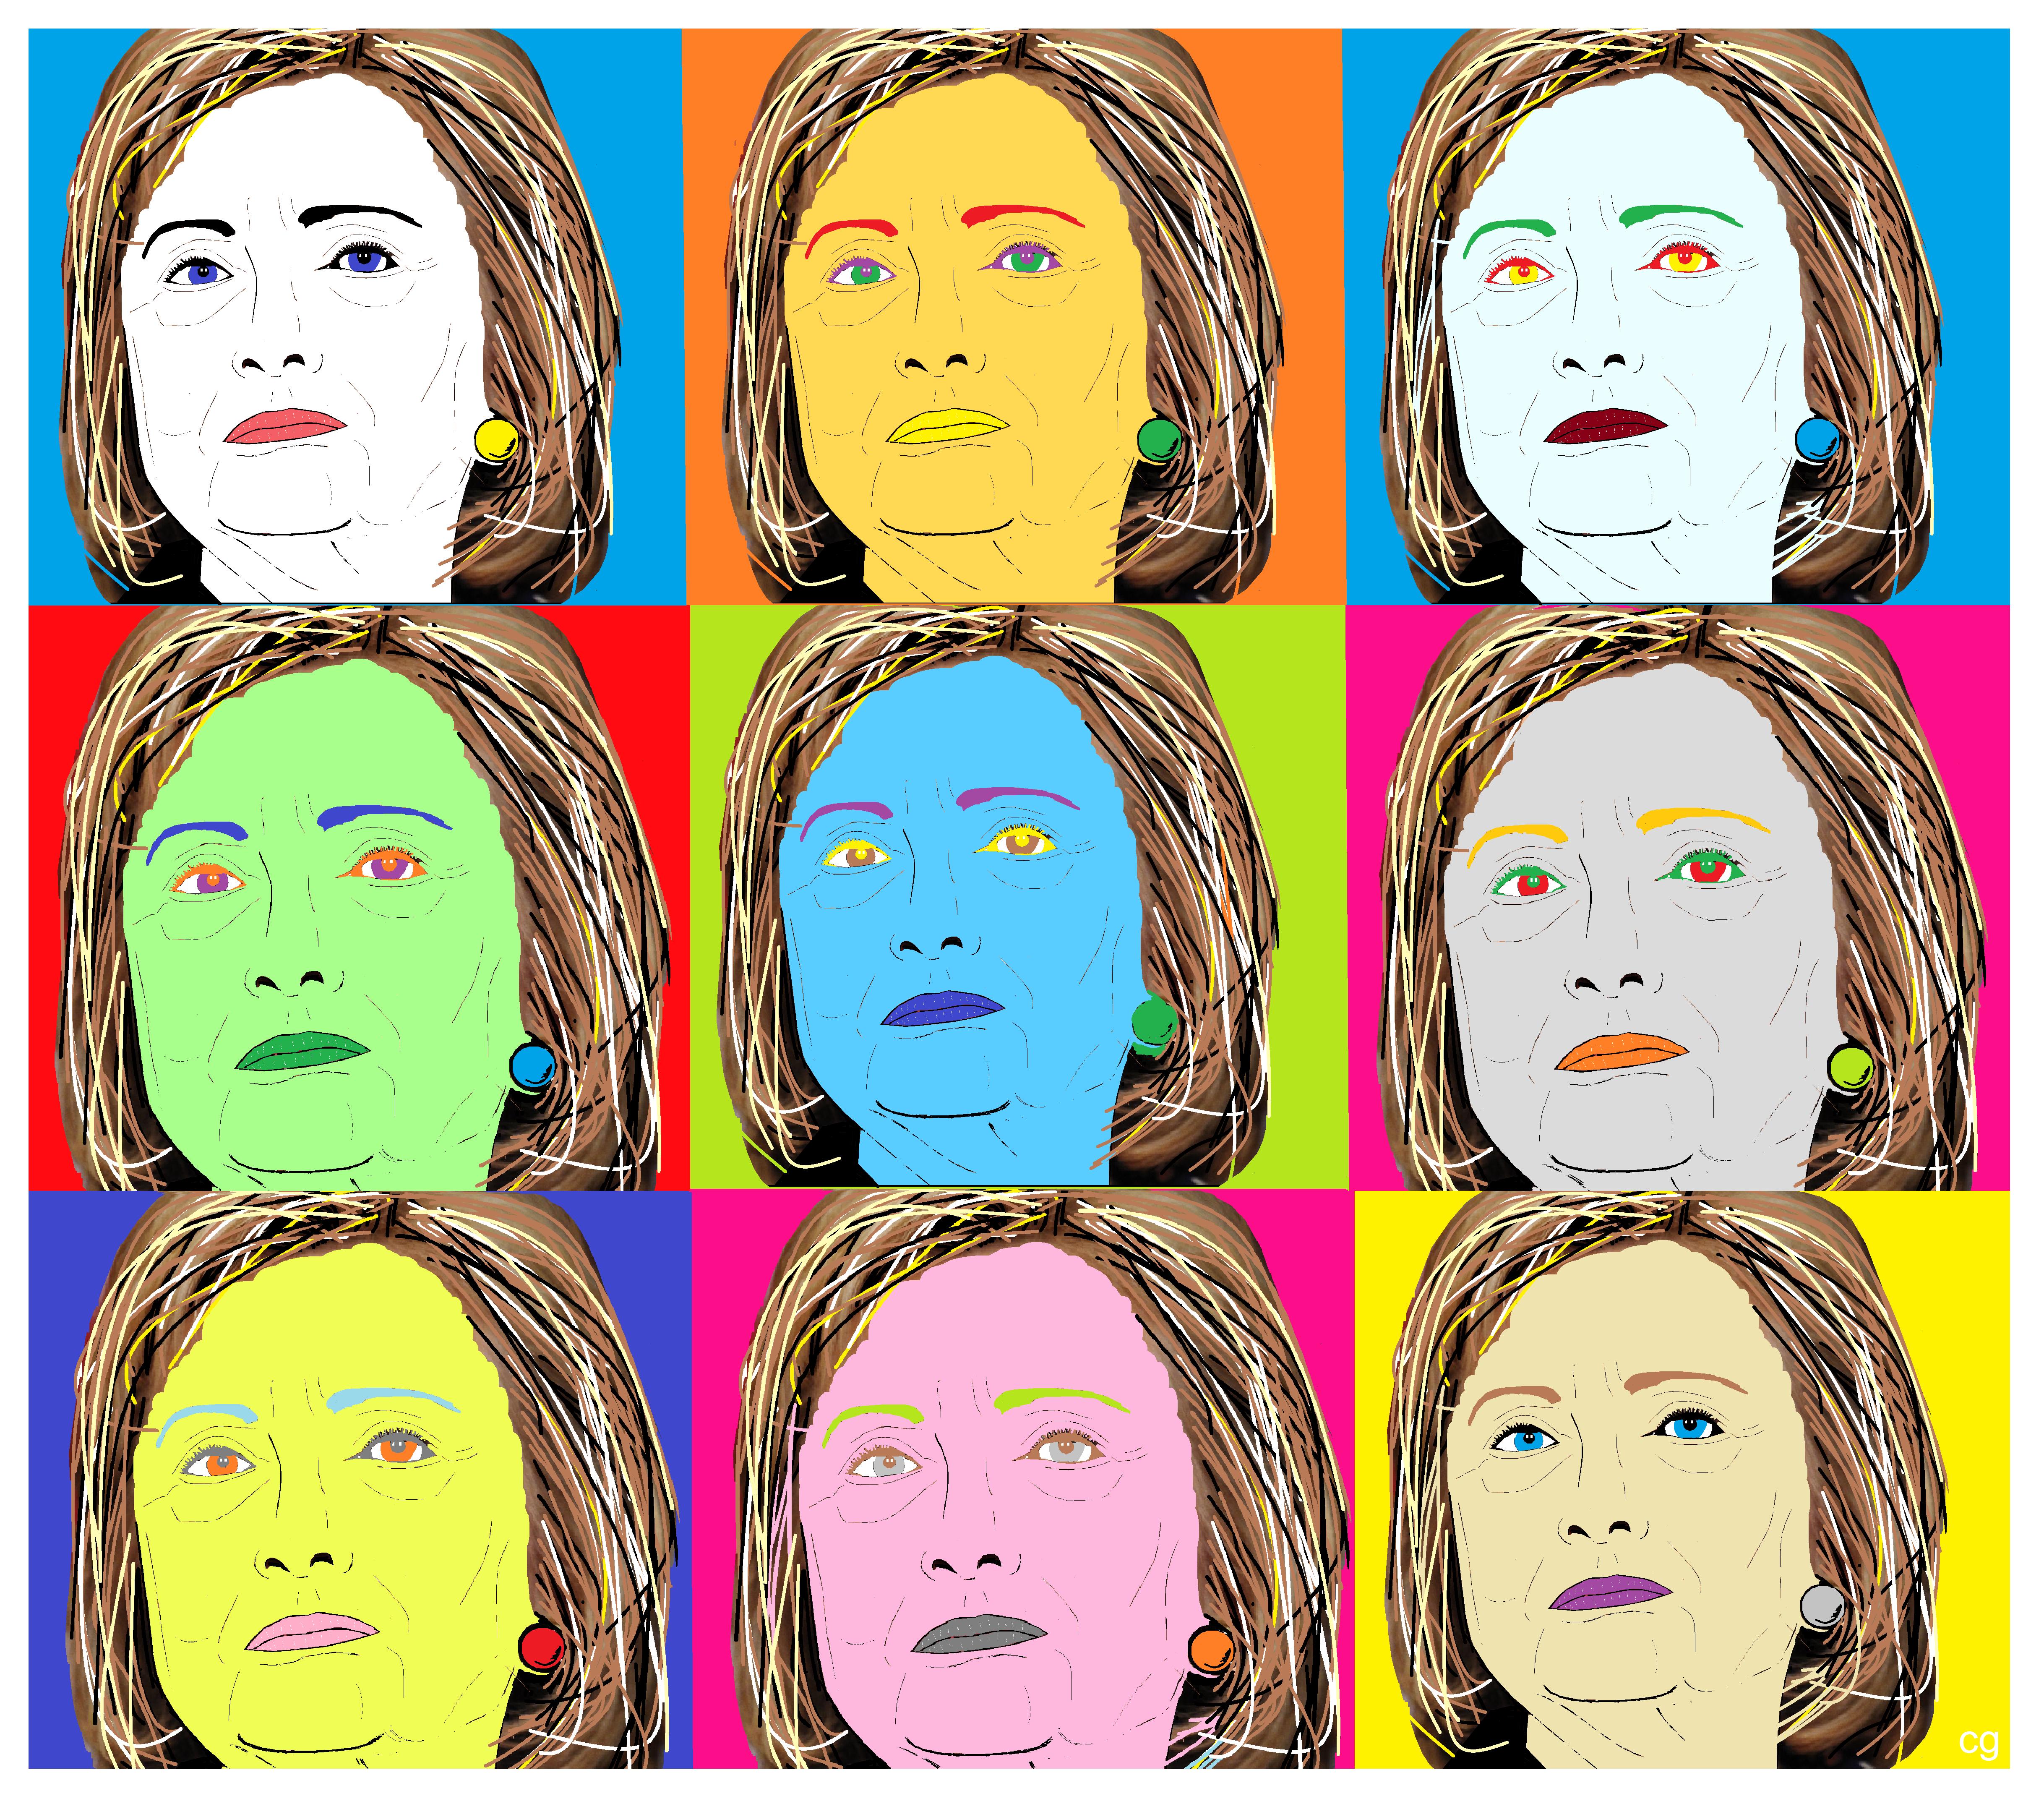 Hillary by cg